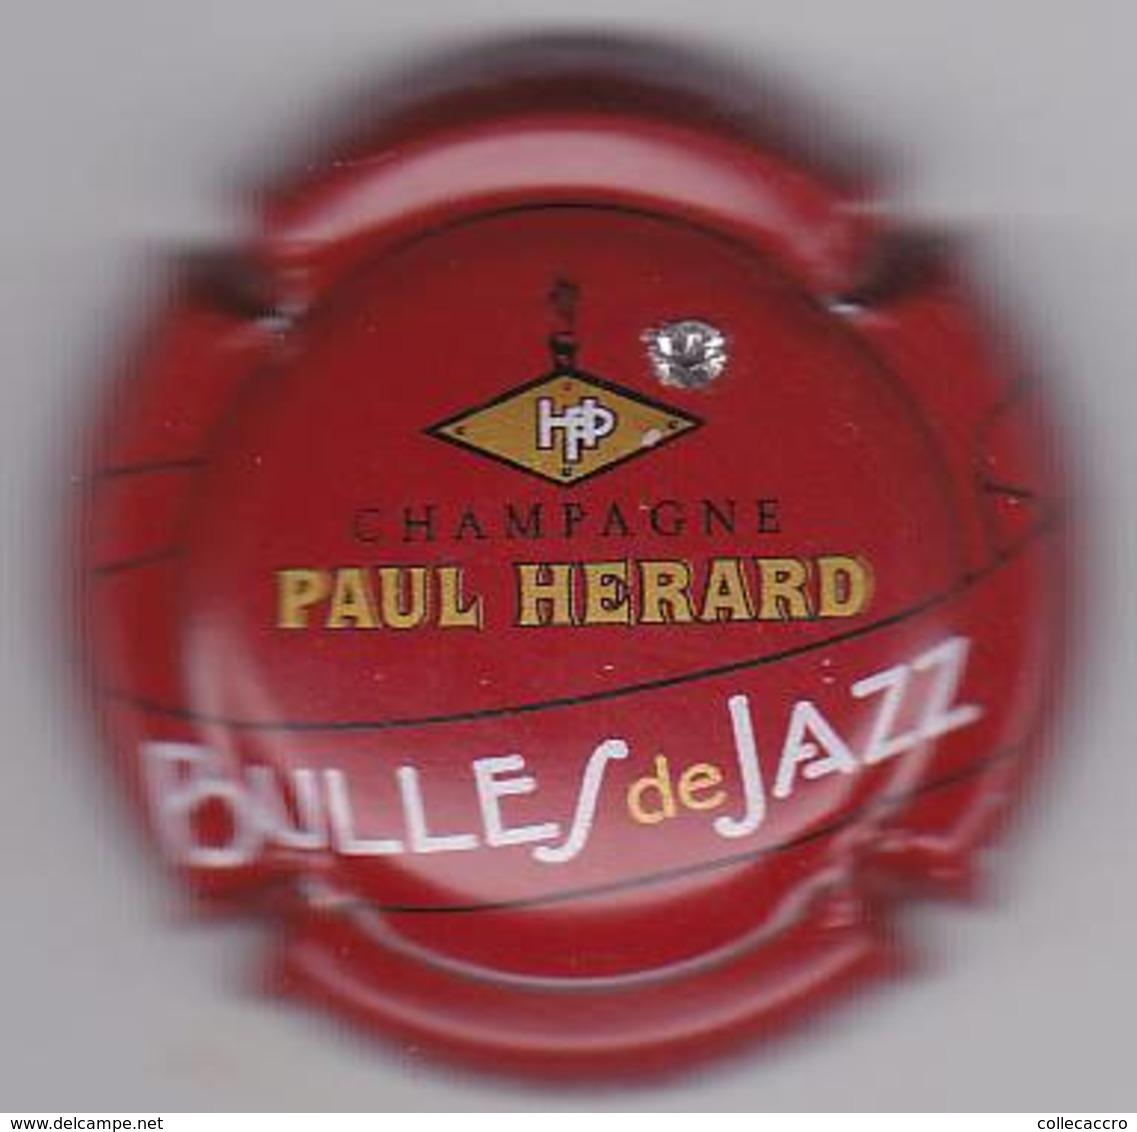 HERARD PAUL BULLES DE JAZZ N°18 STRASS - Champagne